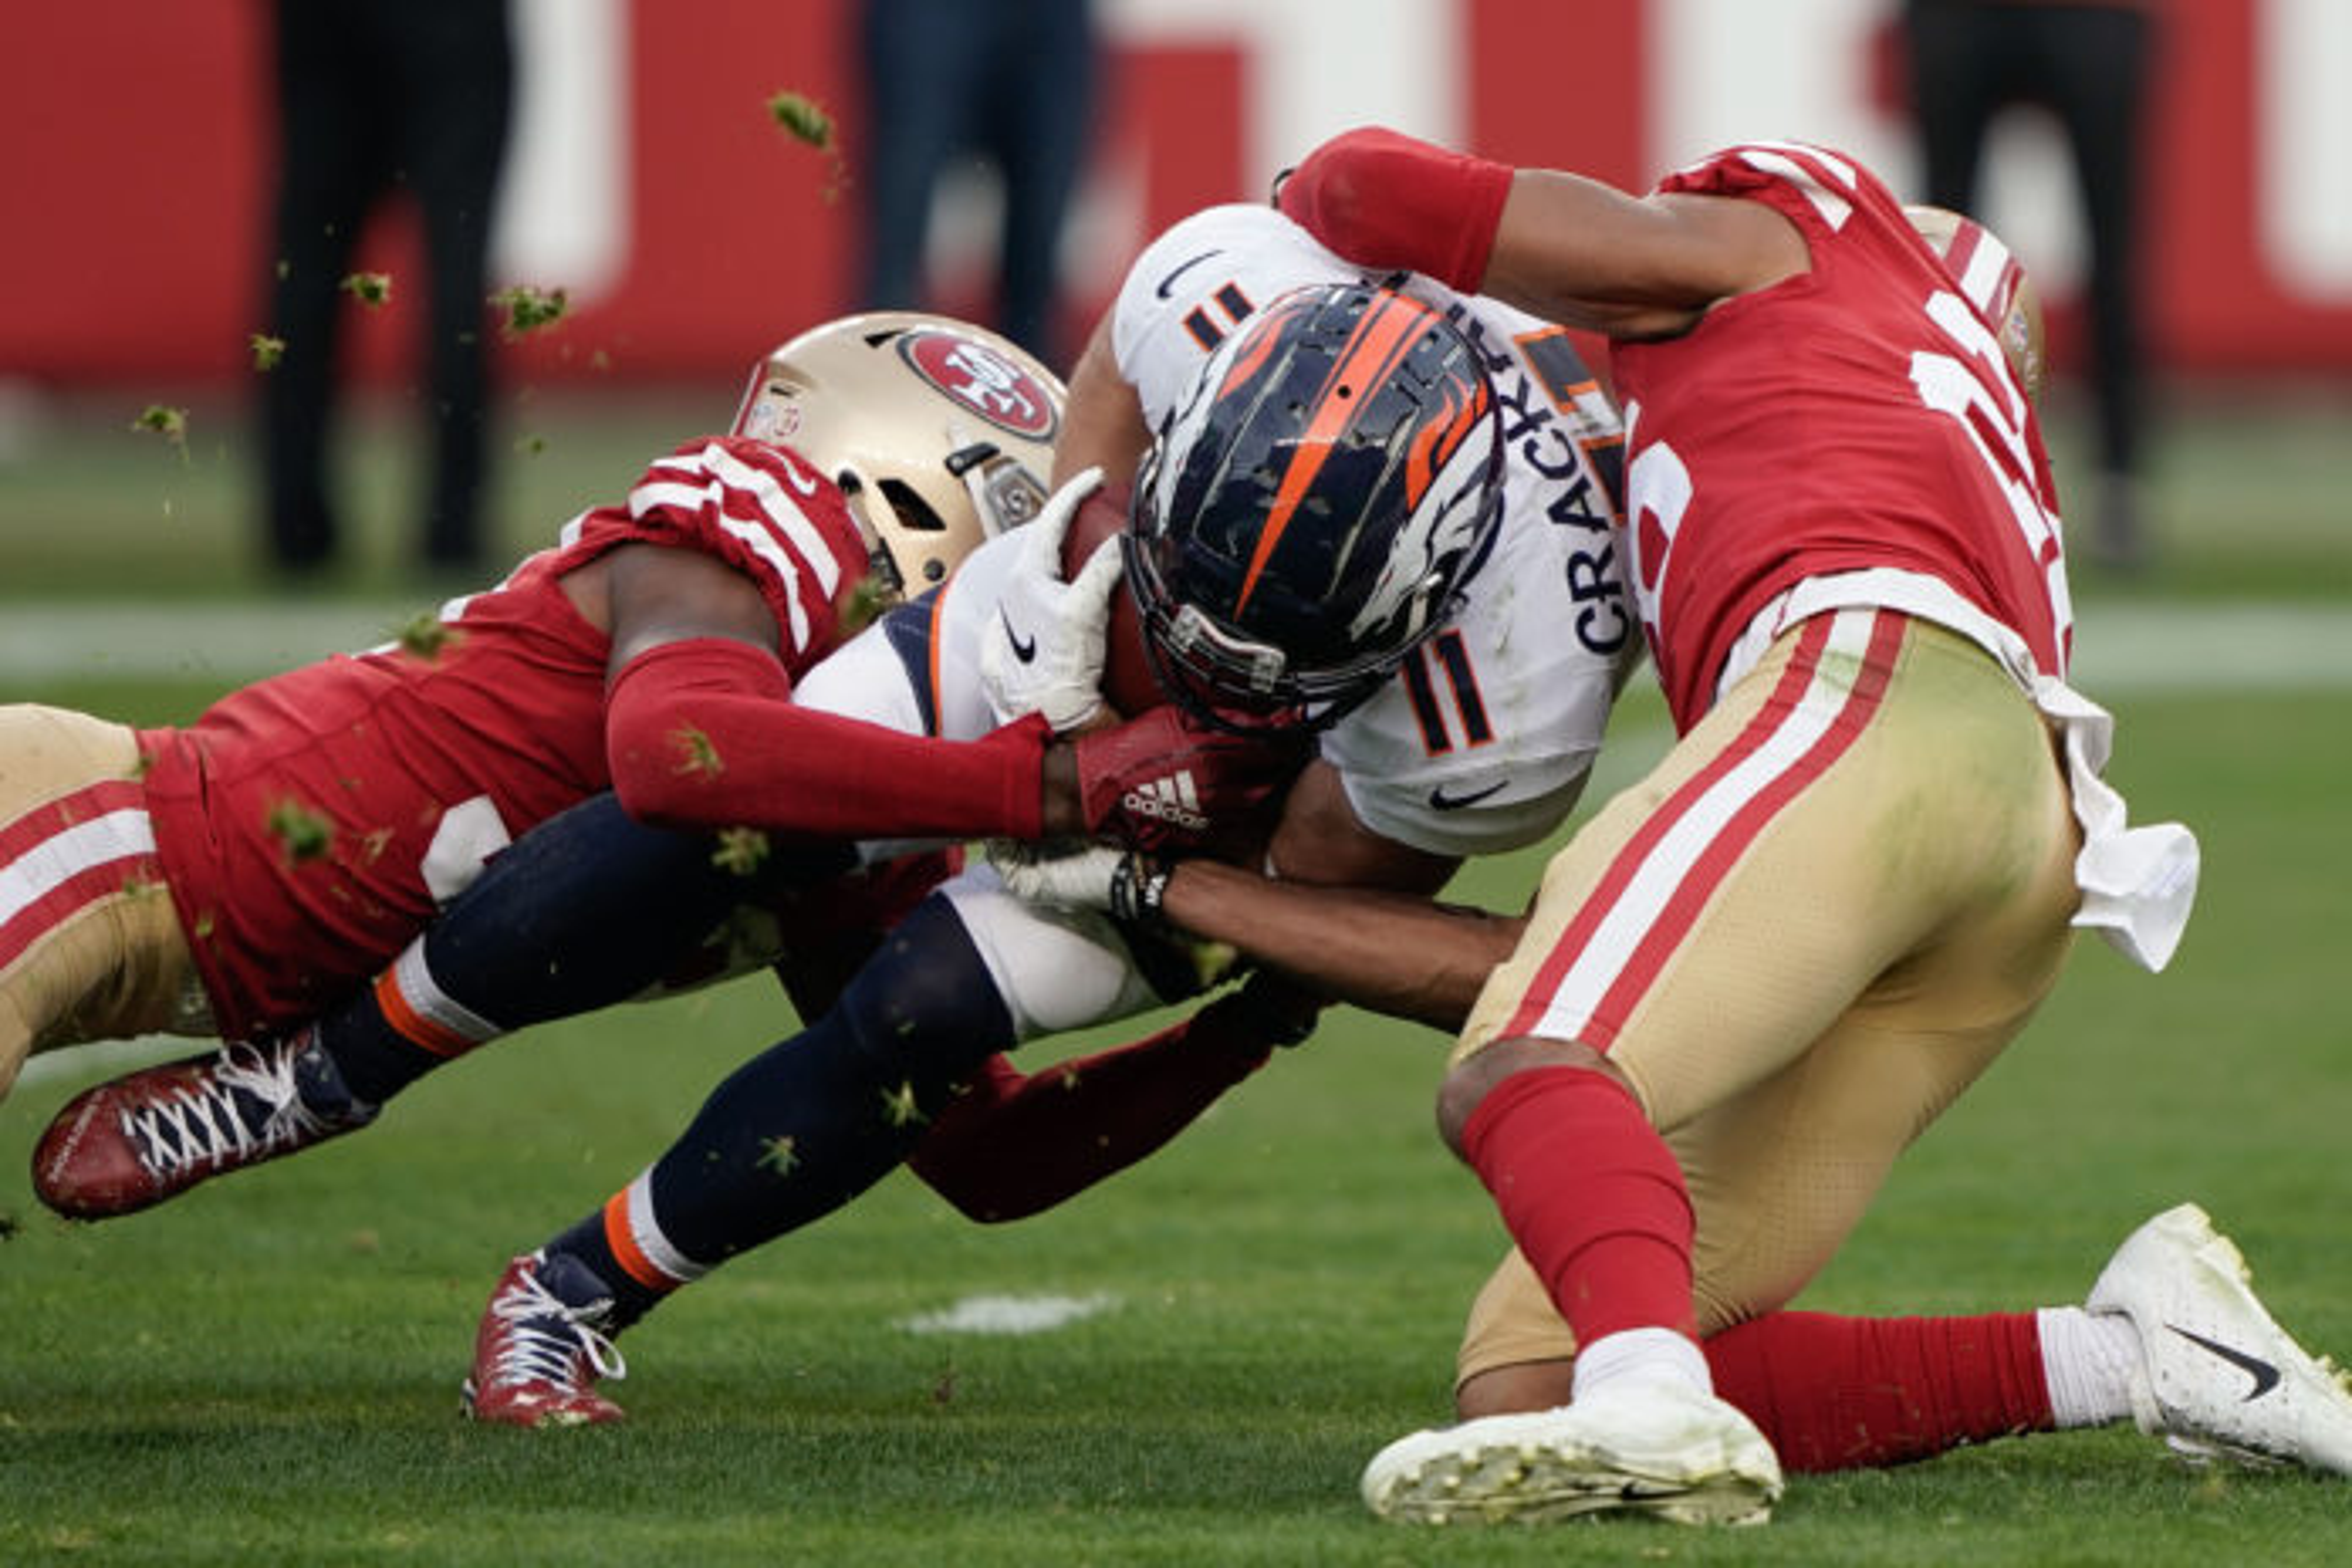 Raiders WR Antonio Brown to play Monday, Jon Gruden says